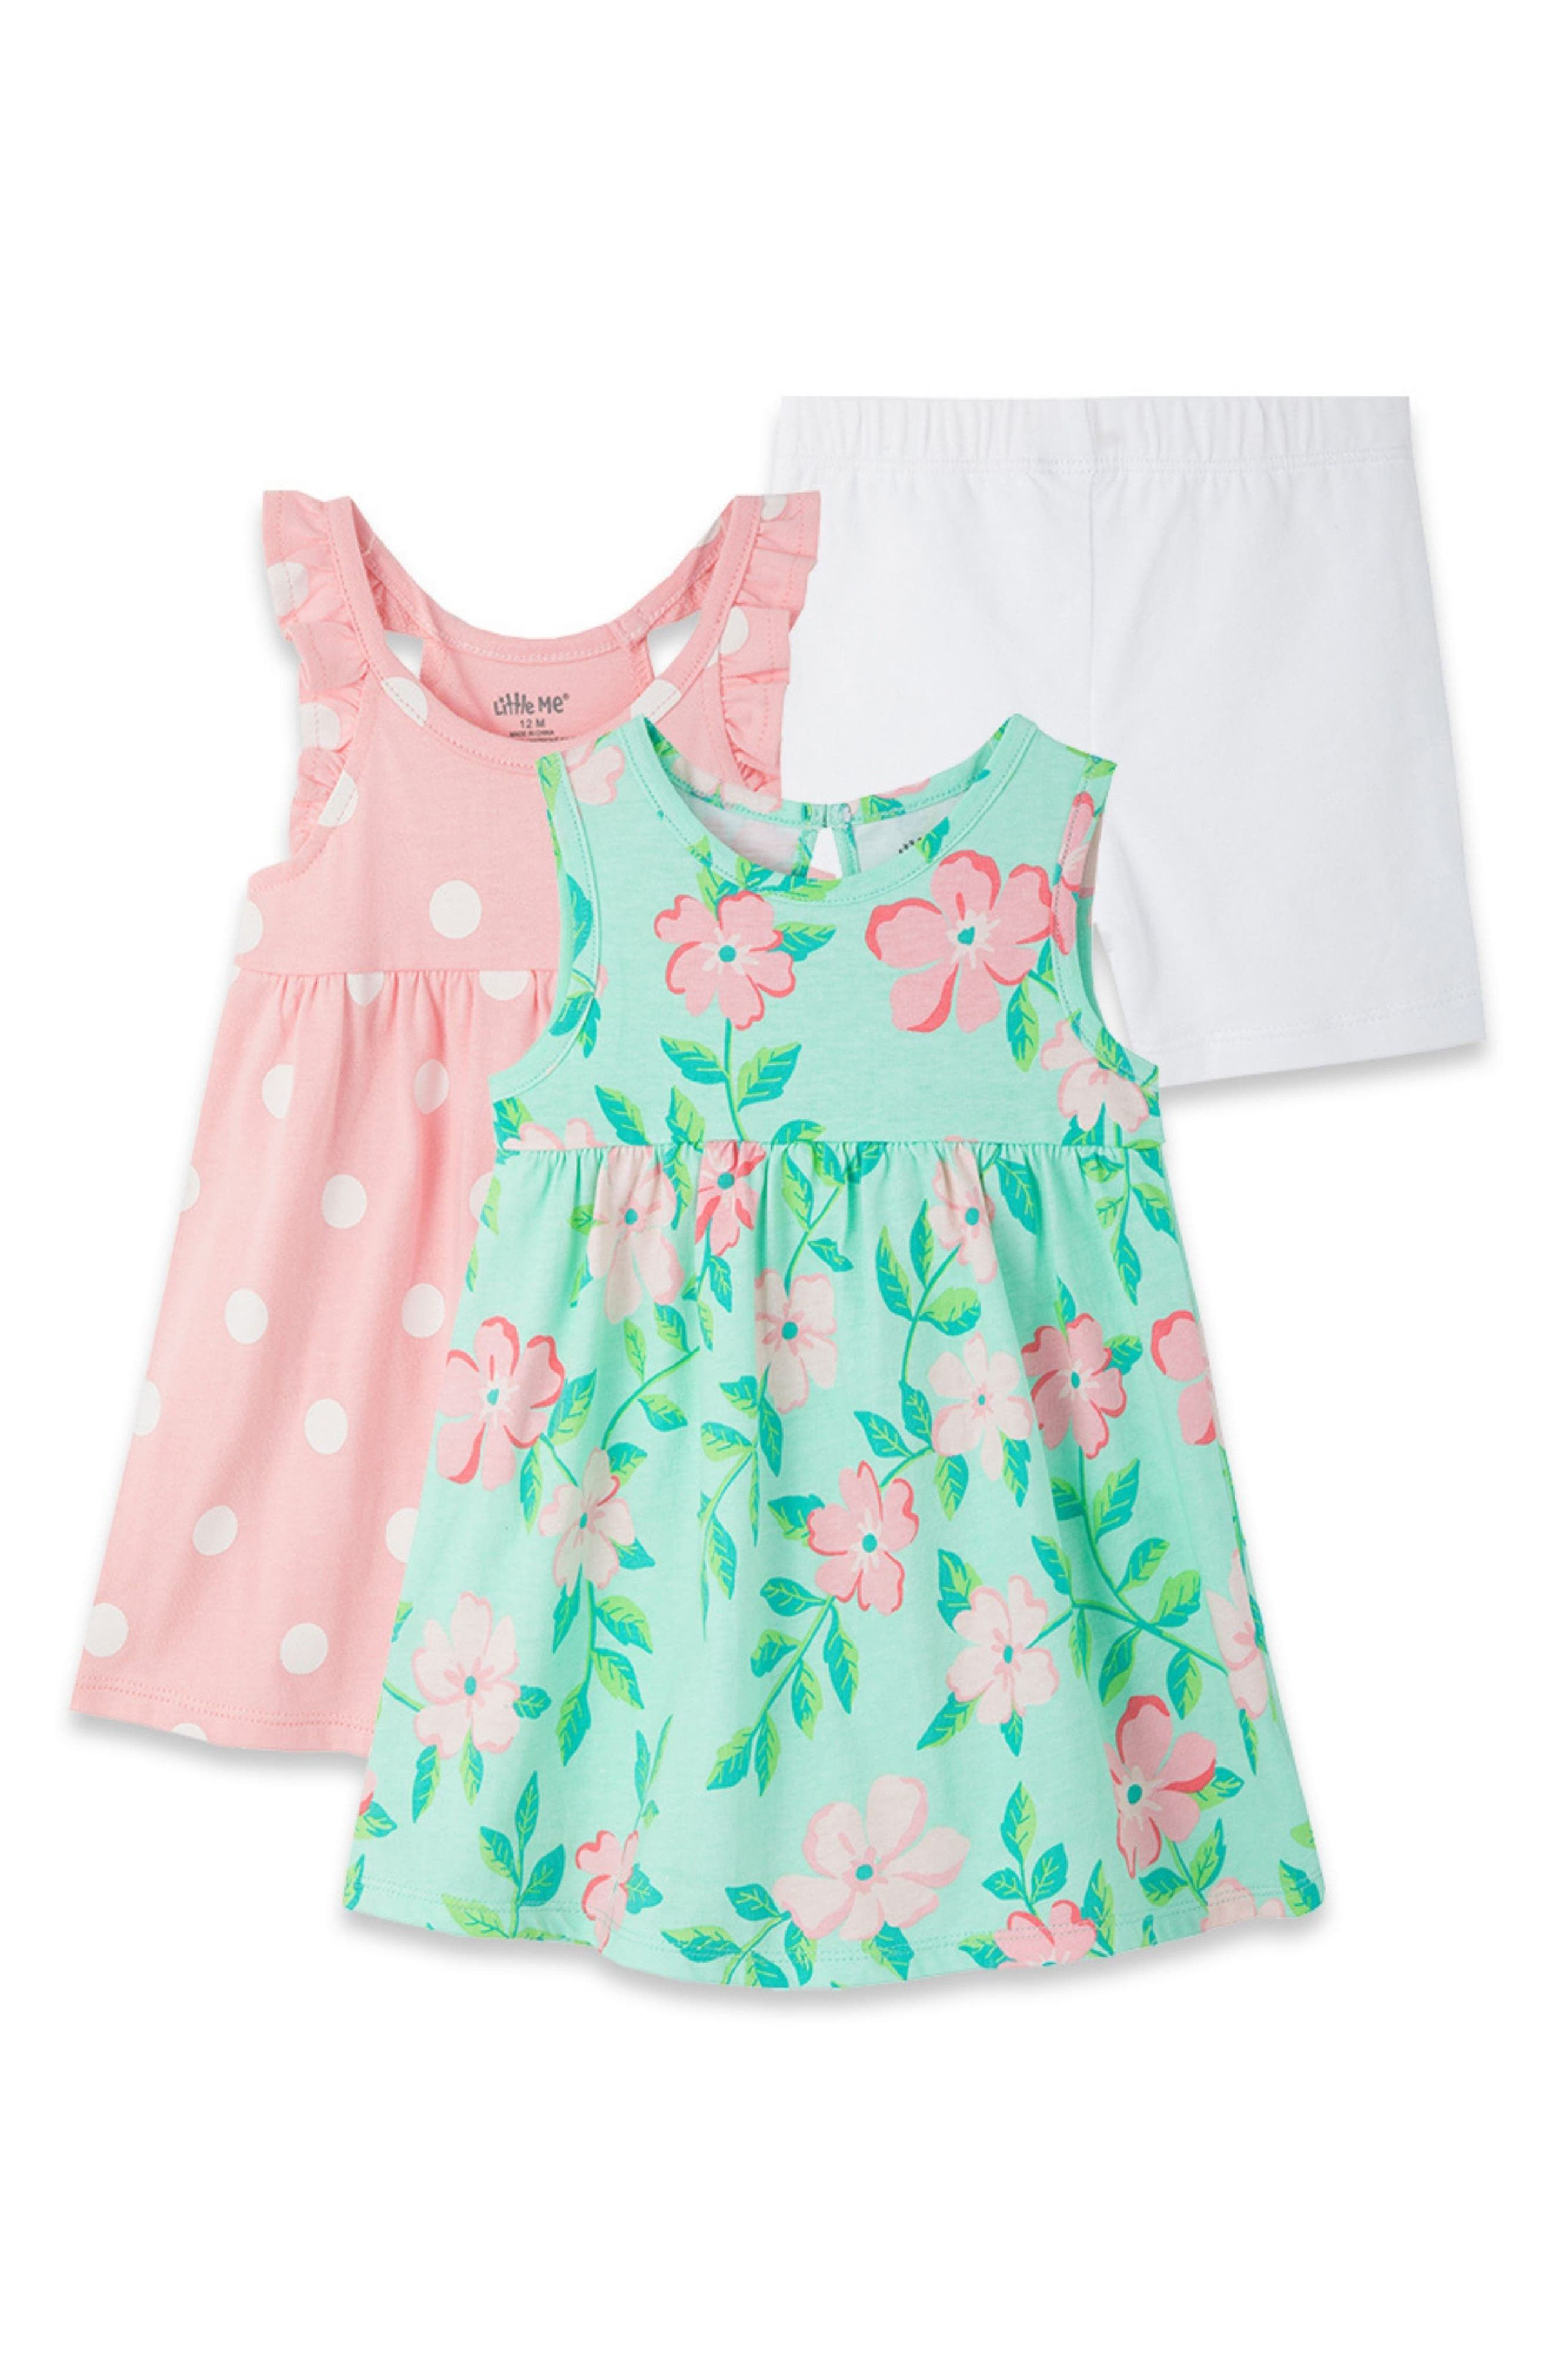 Little Me Girl Toddler Pink Floral Dress Size 18M